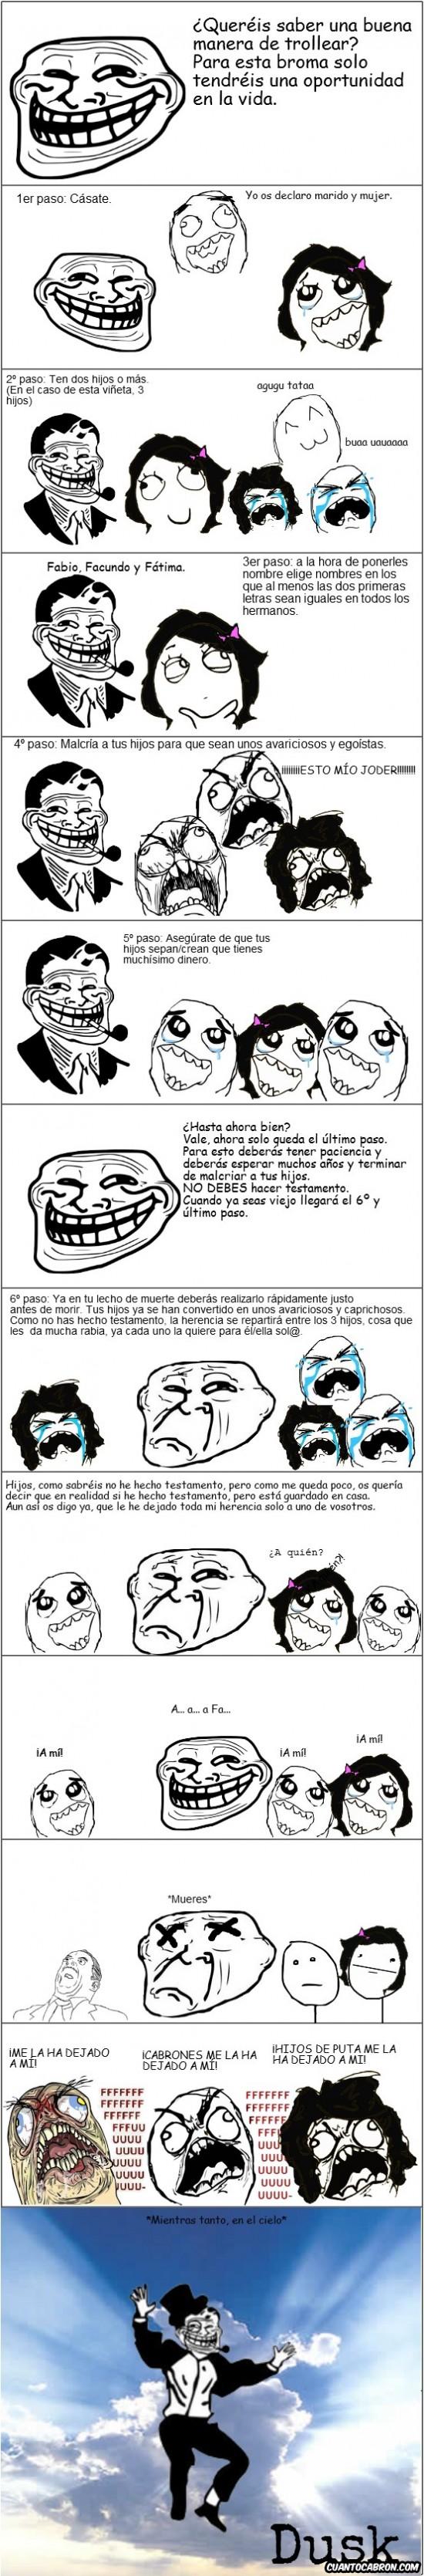 Trollface - Broma troll preparada durante toda tu vida